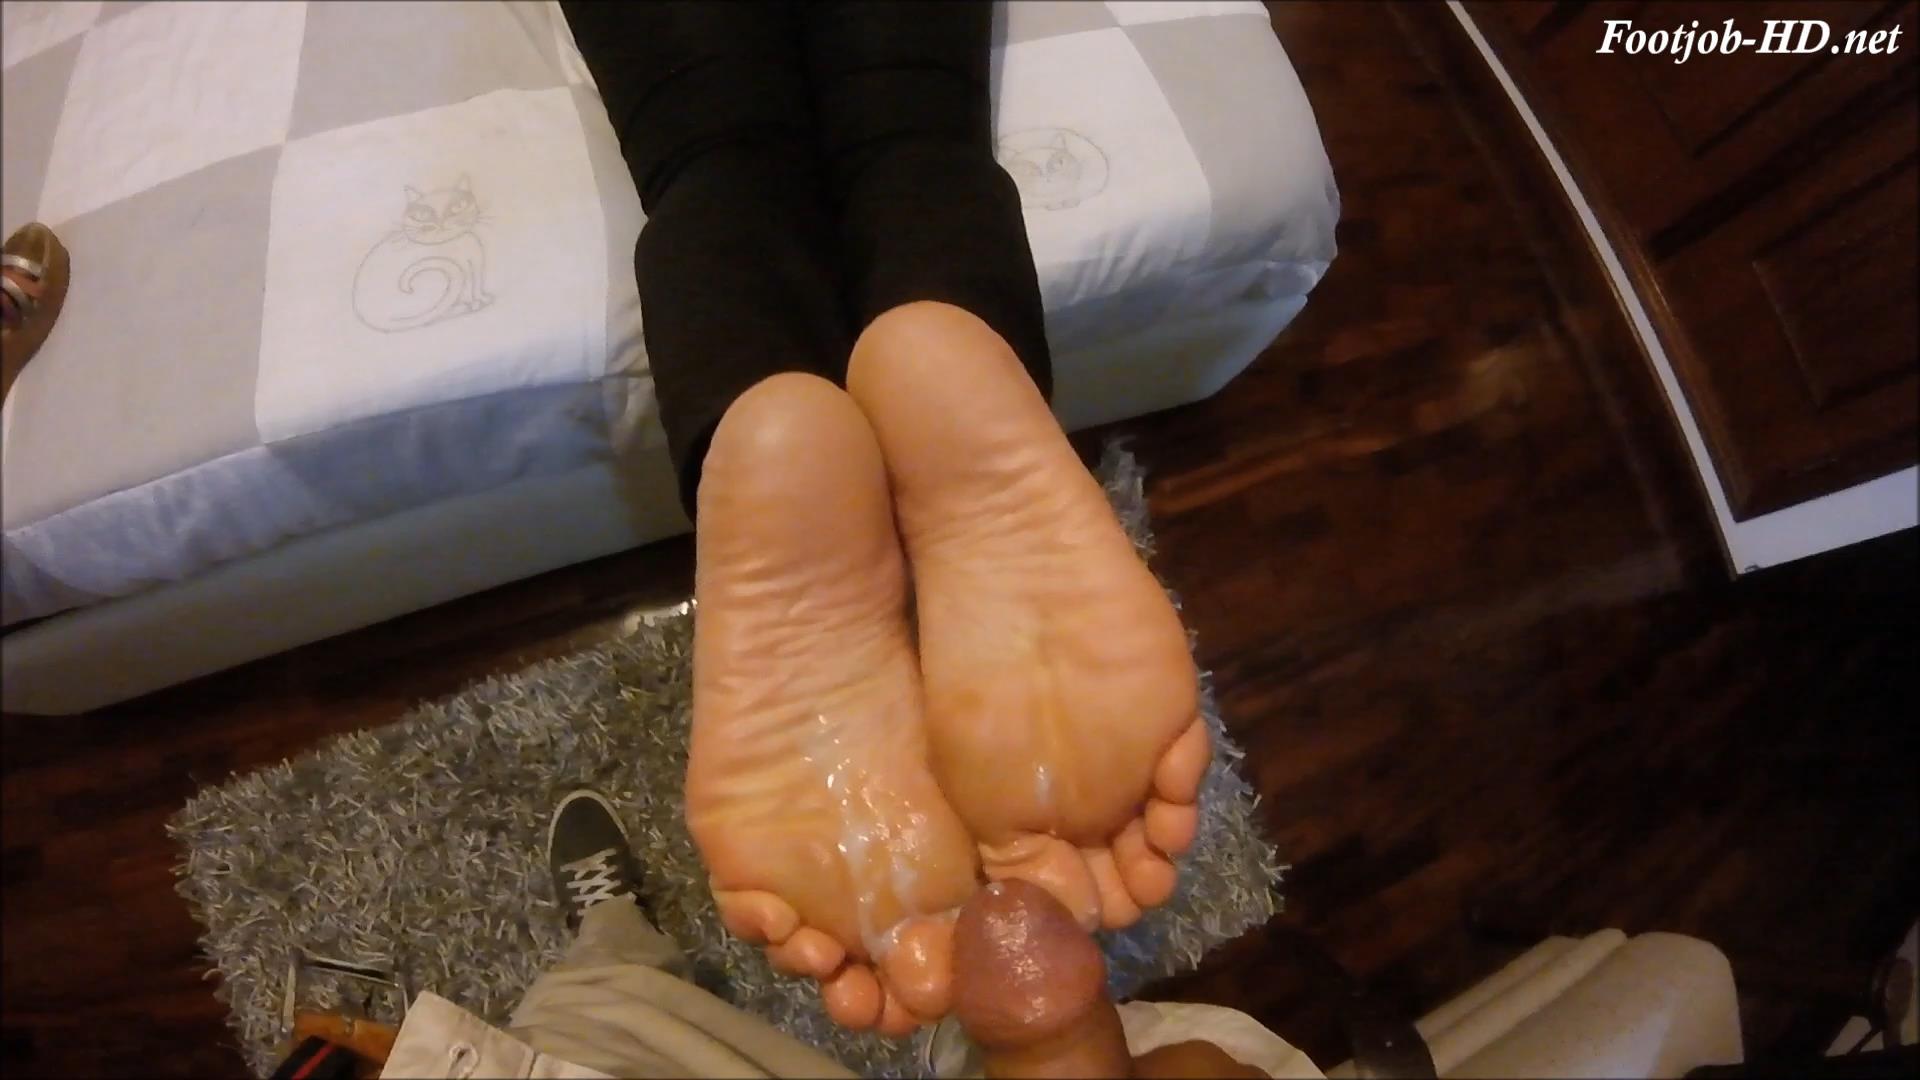 15_hours\'_worth_Foot_Gunk_-_Classy_Feet.jpg